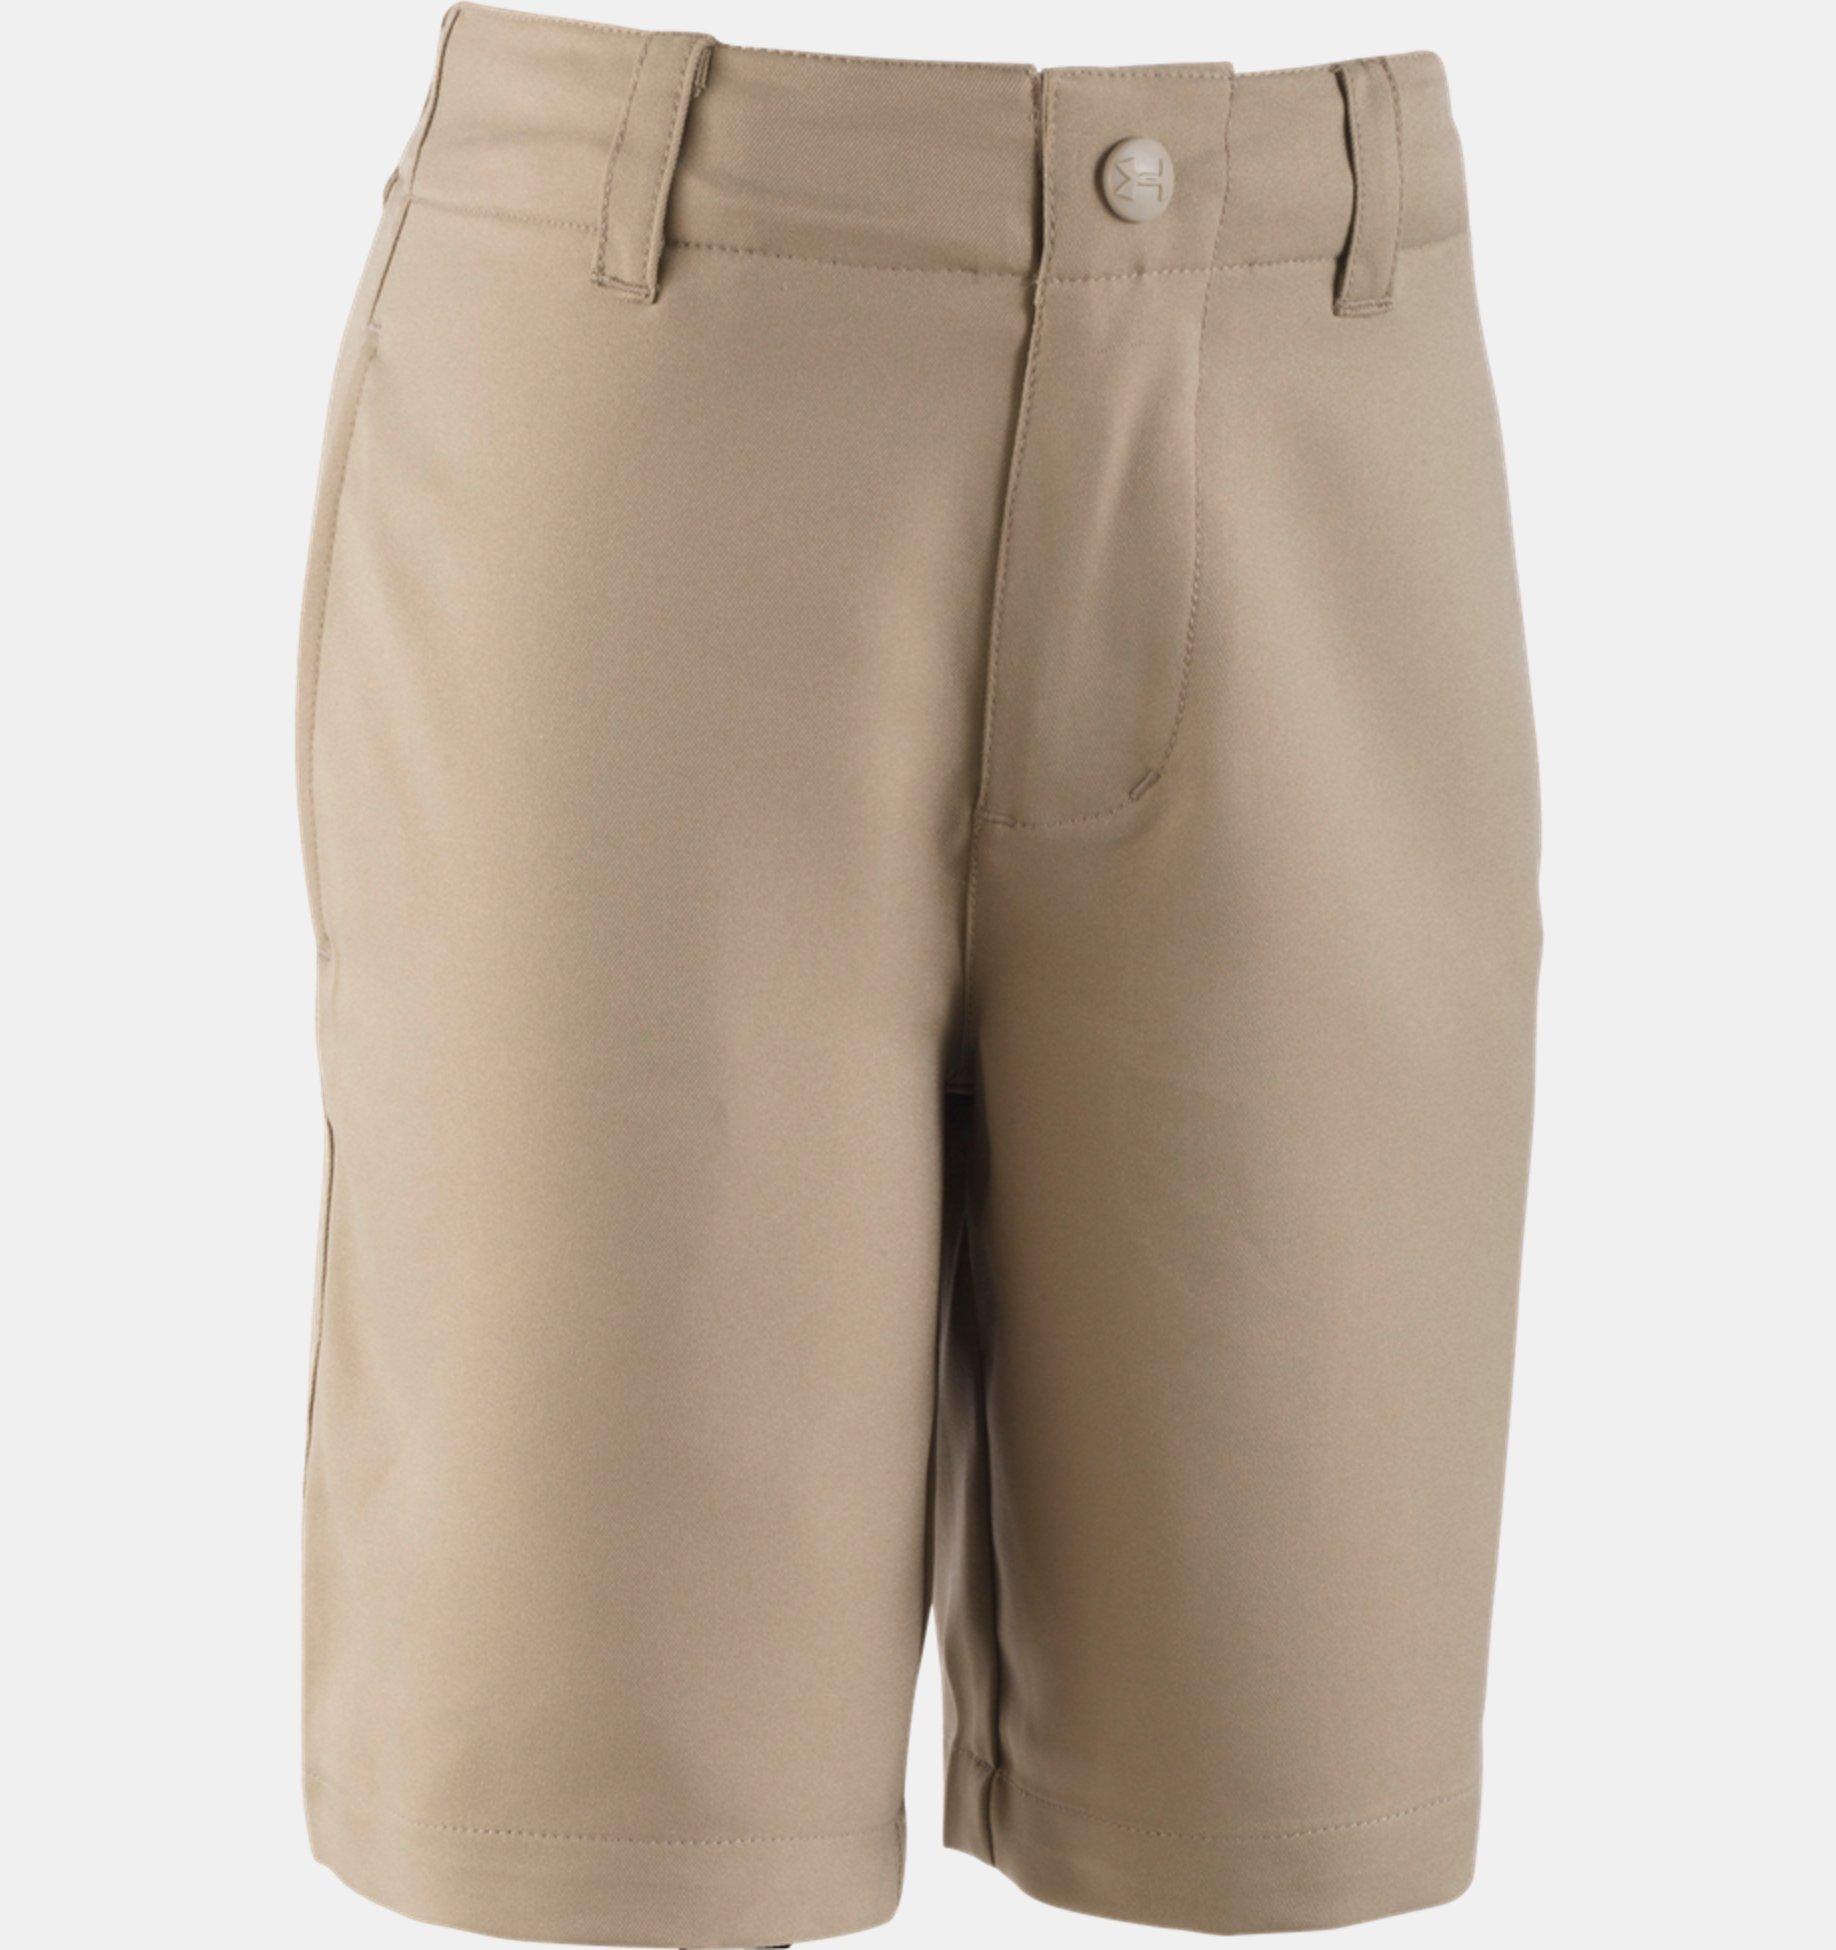 Underarmour Boys Newborn UA Golf Medal Play Shorts